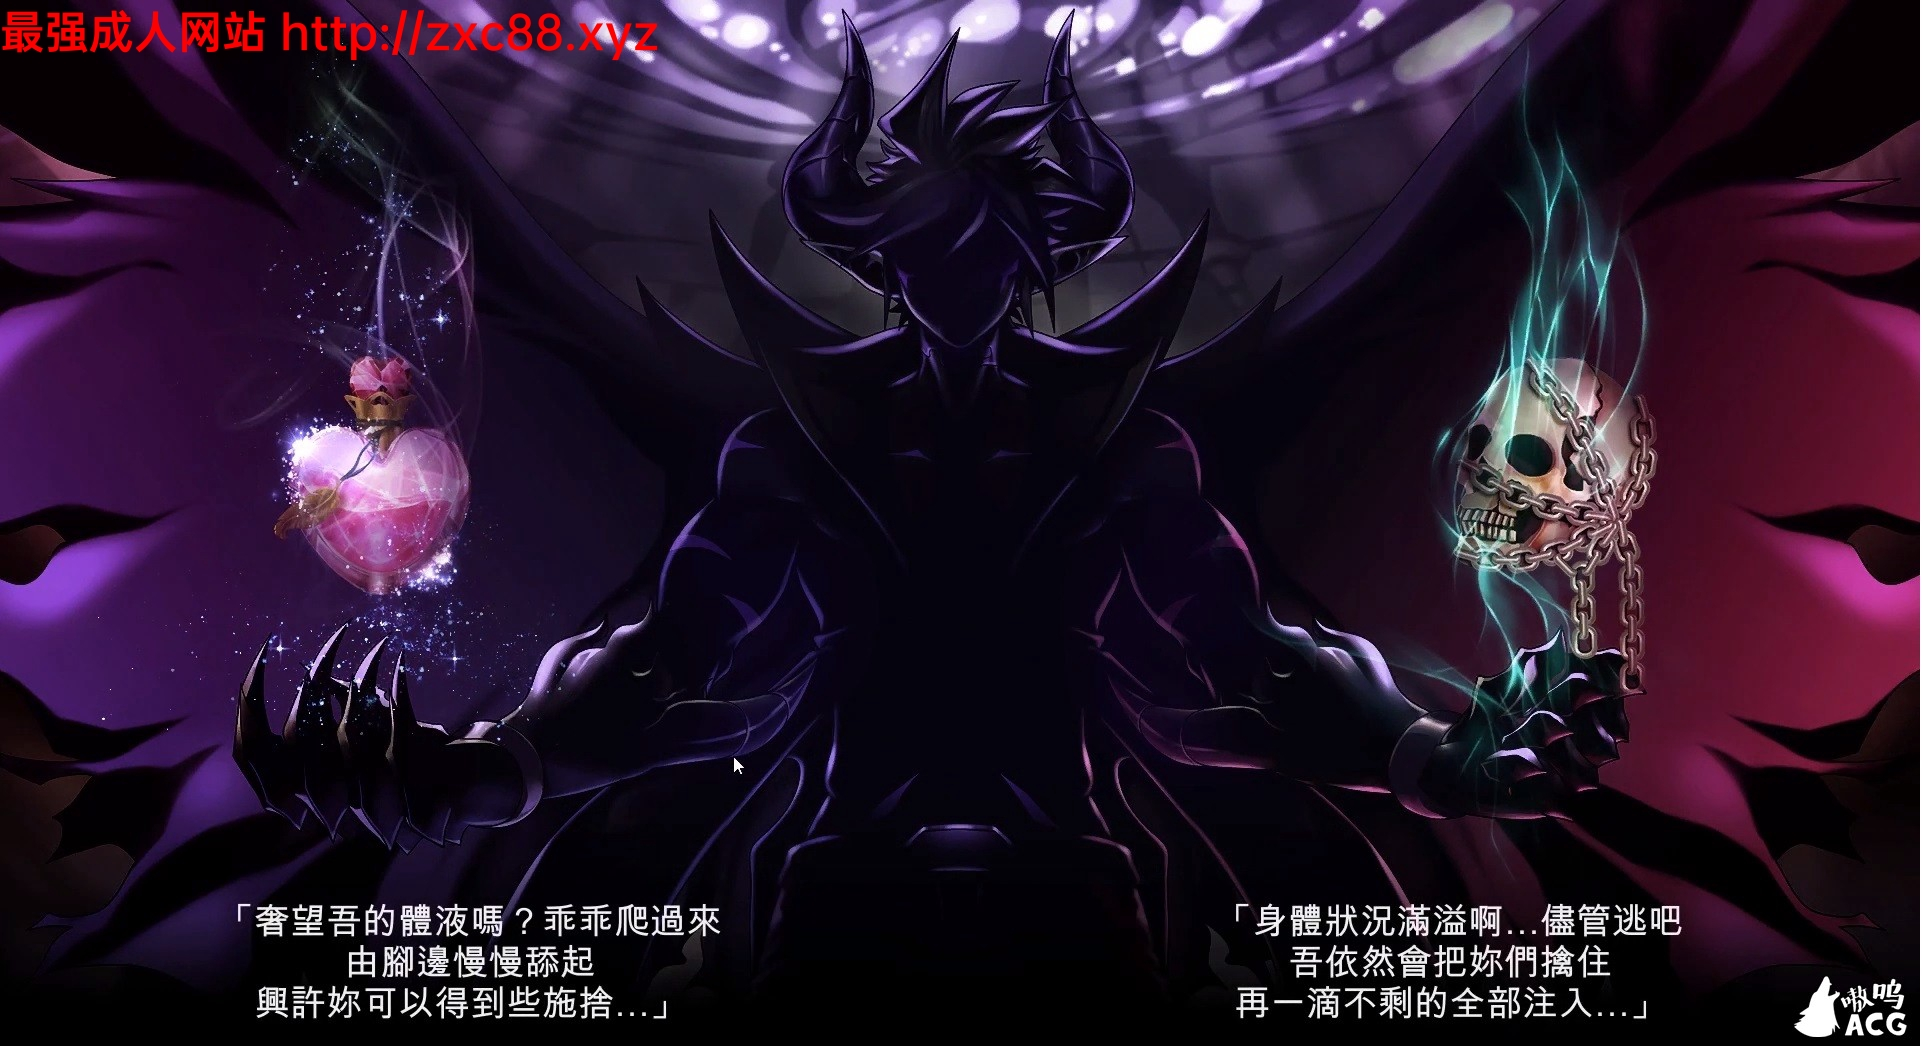 Re:Gals Panic 幻想天蚕变 STEAM官中破·解/社保补丁【新作/SLG/中文/步兵/250M】